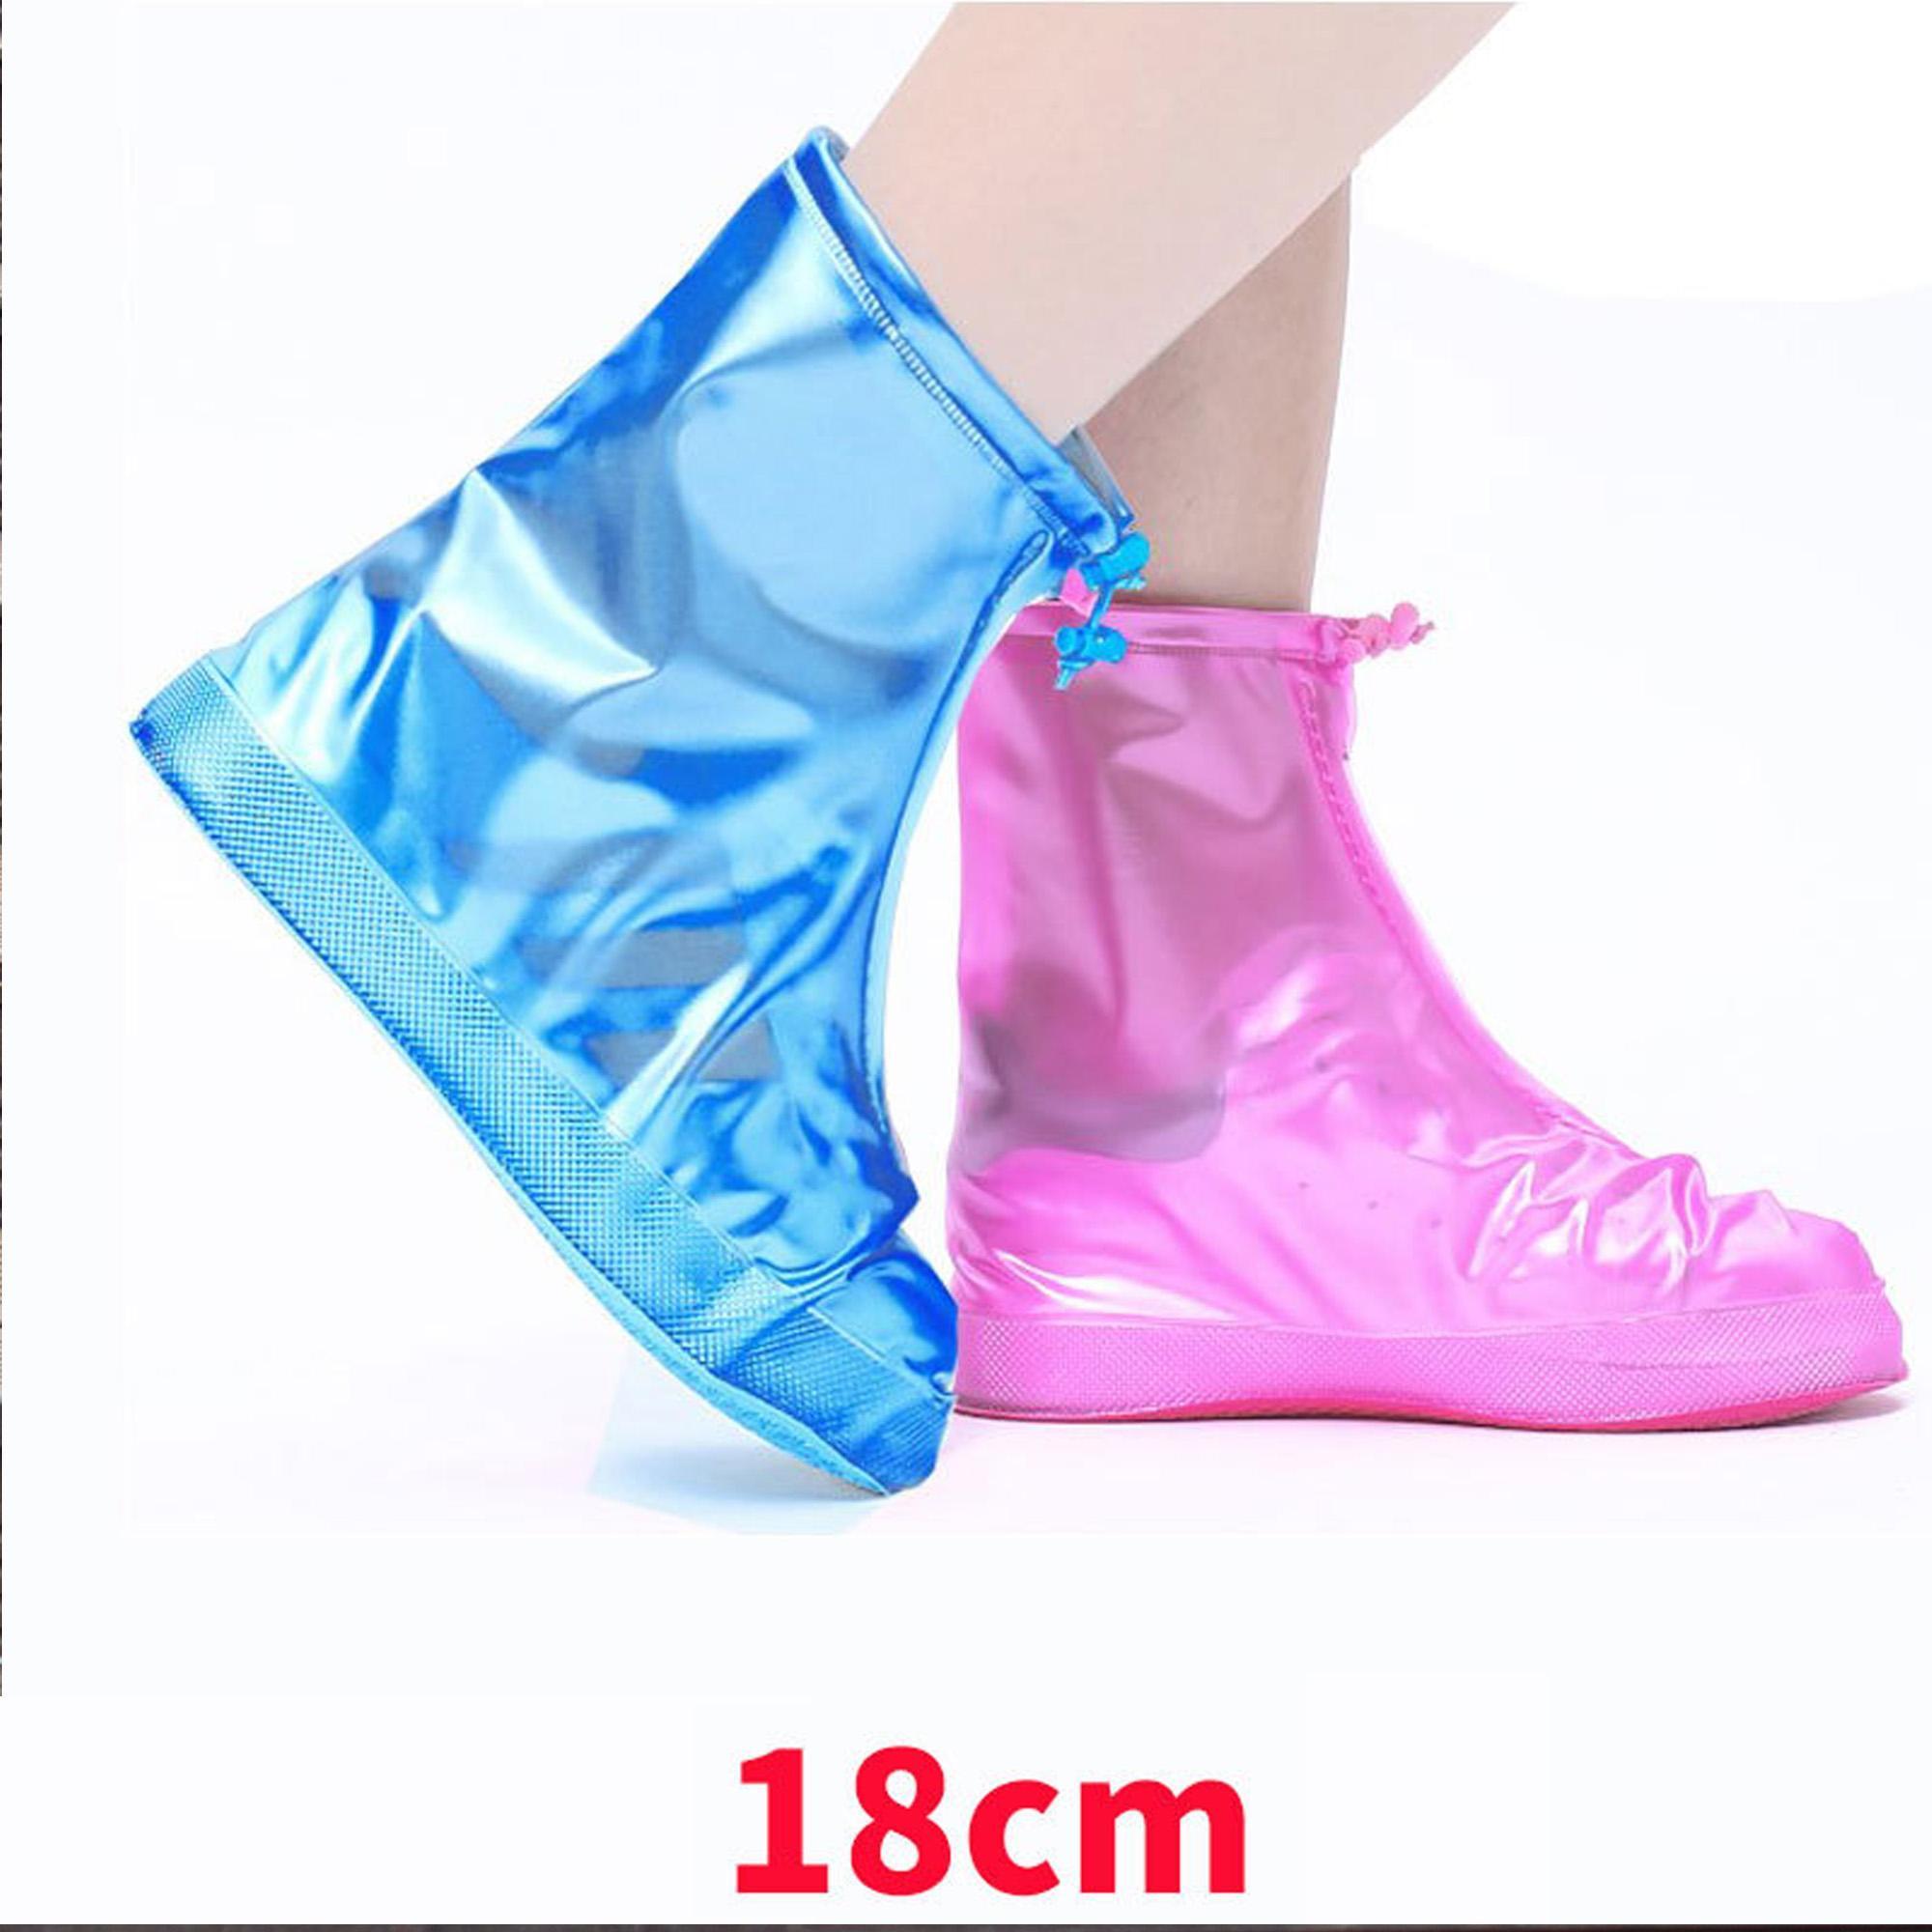 93dcff279c UCORP WATER PROOF RAIN SHOES Non-slip rain shoe covers